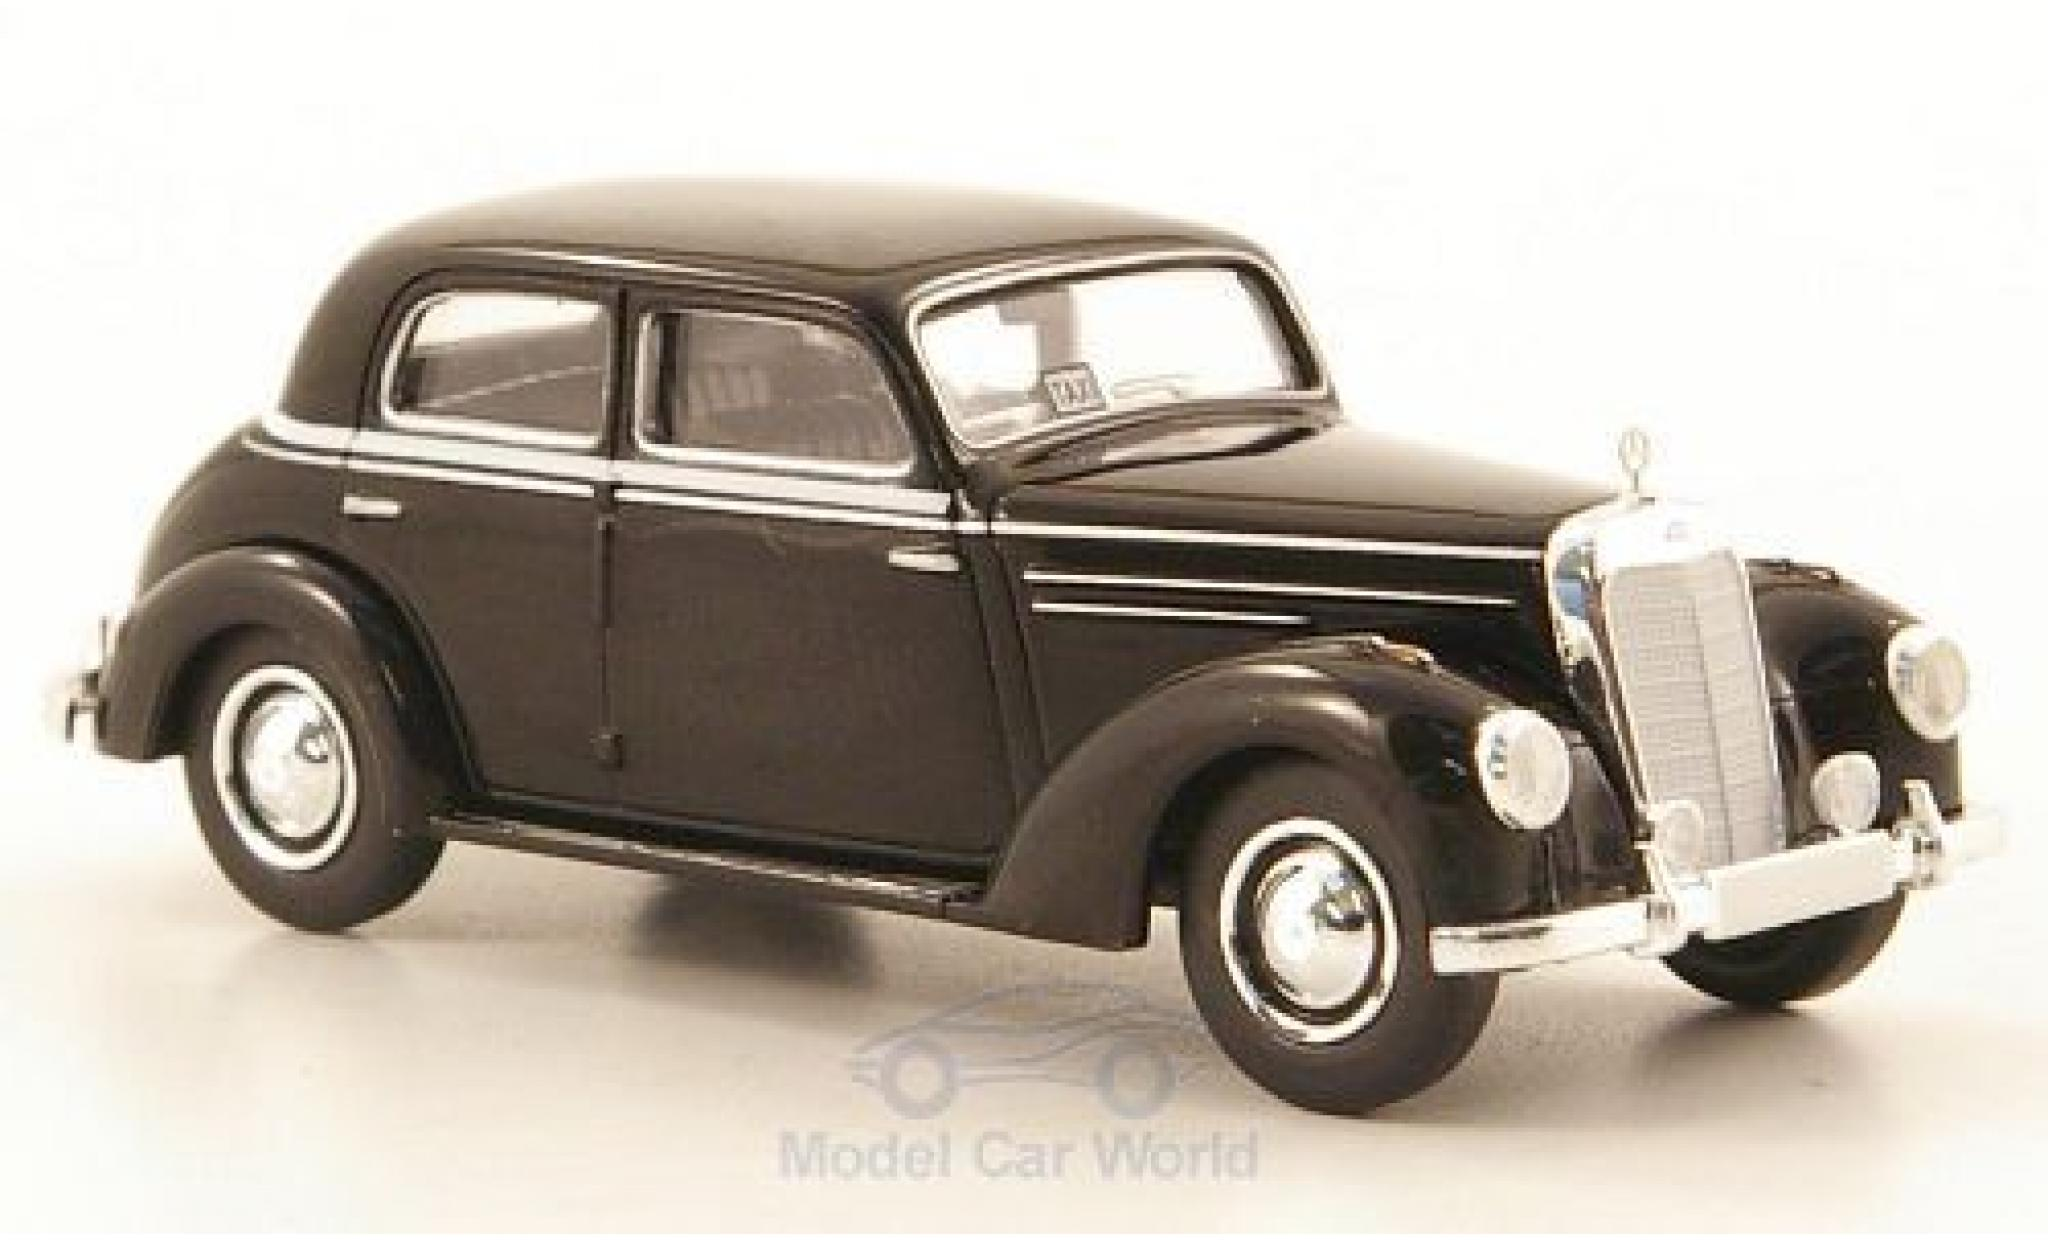 Mercedes 220 1/87 Brekina Starmada (W187) black Taxi